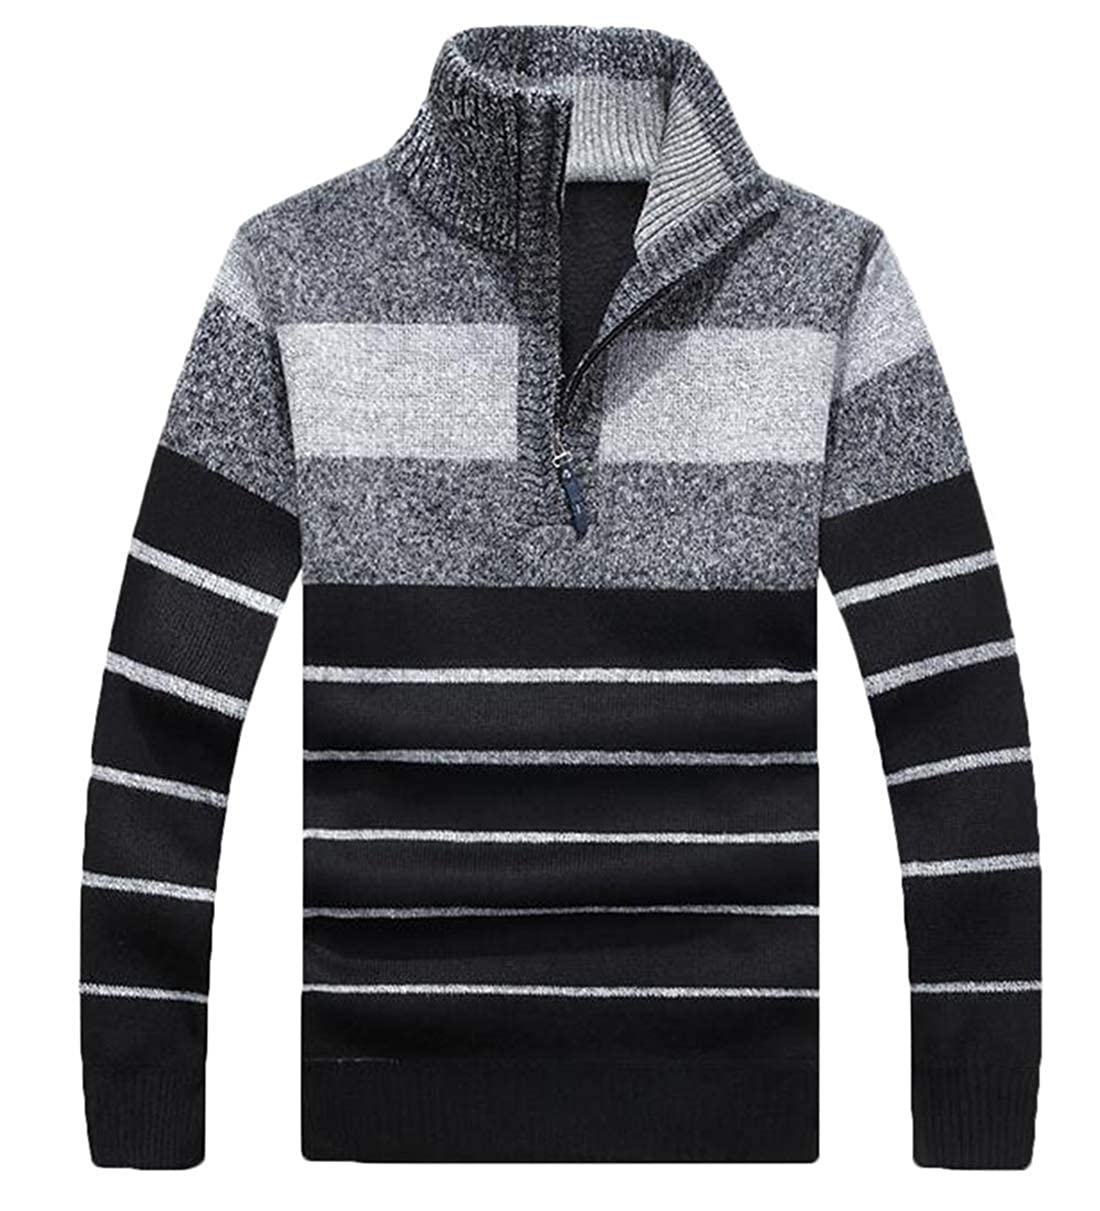 XiaoTianXinMen XTX Mens Fashion Warm 1//4 Zipper Striped Knit Mock Neck Pullover Sweater